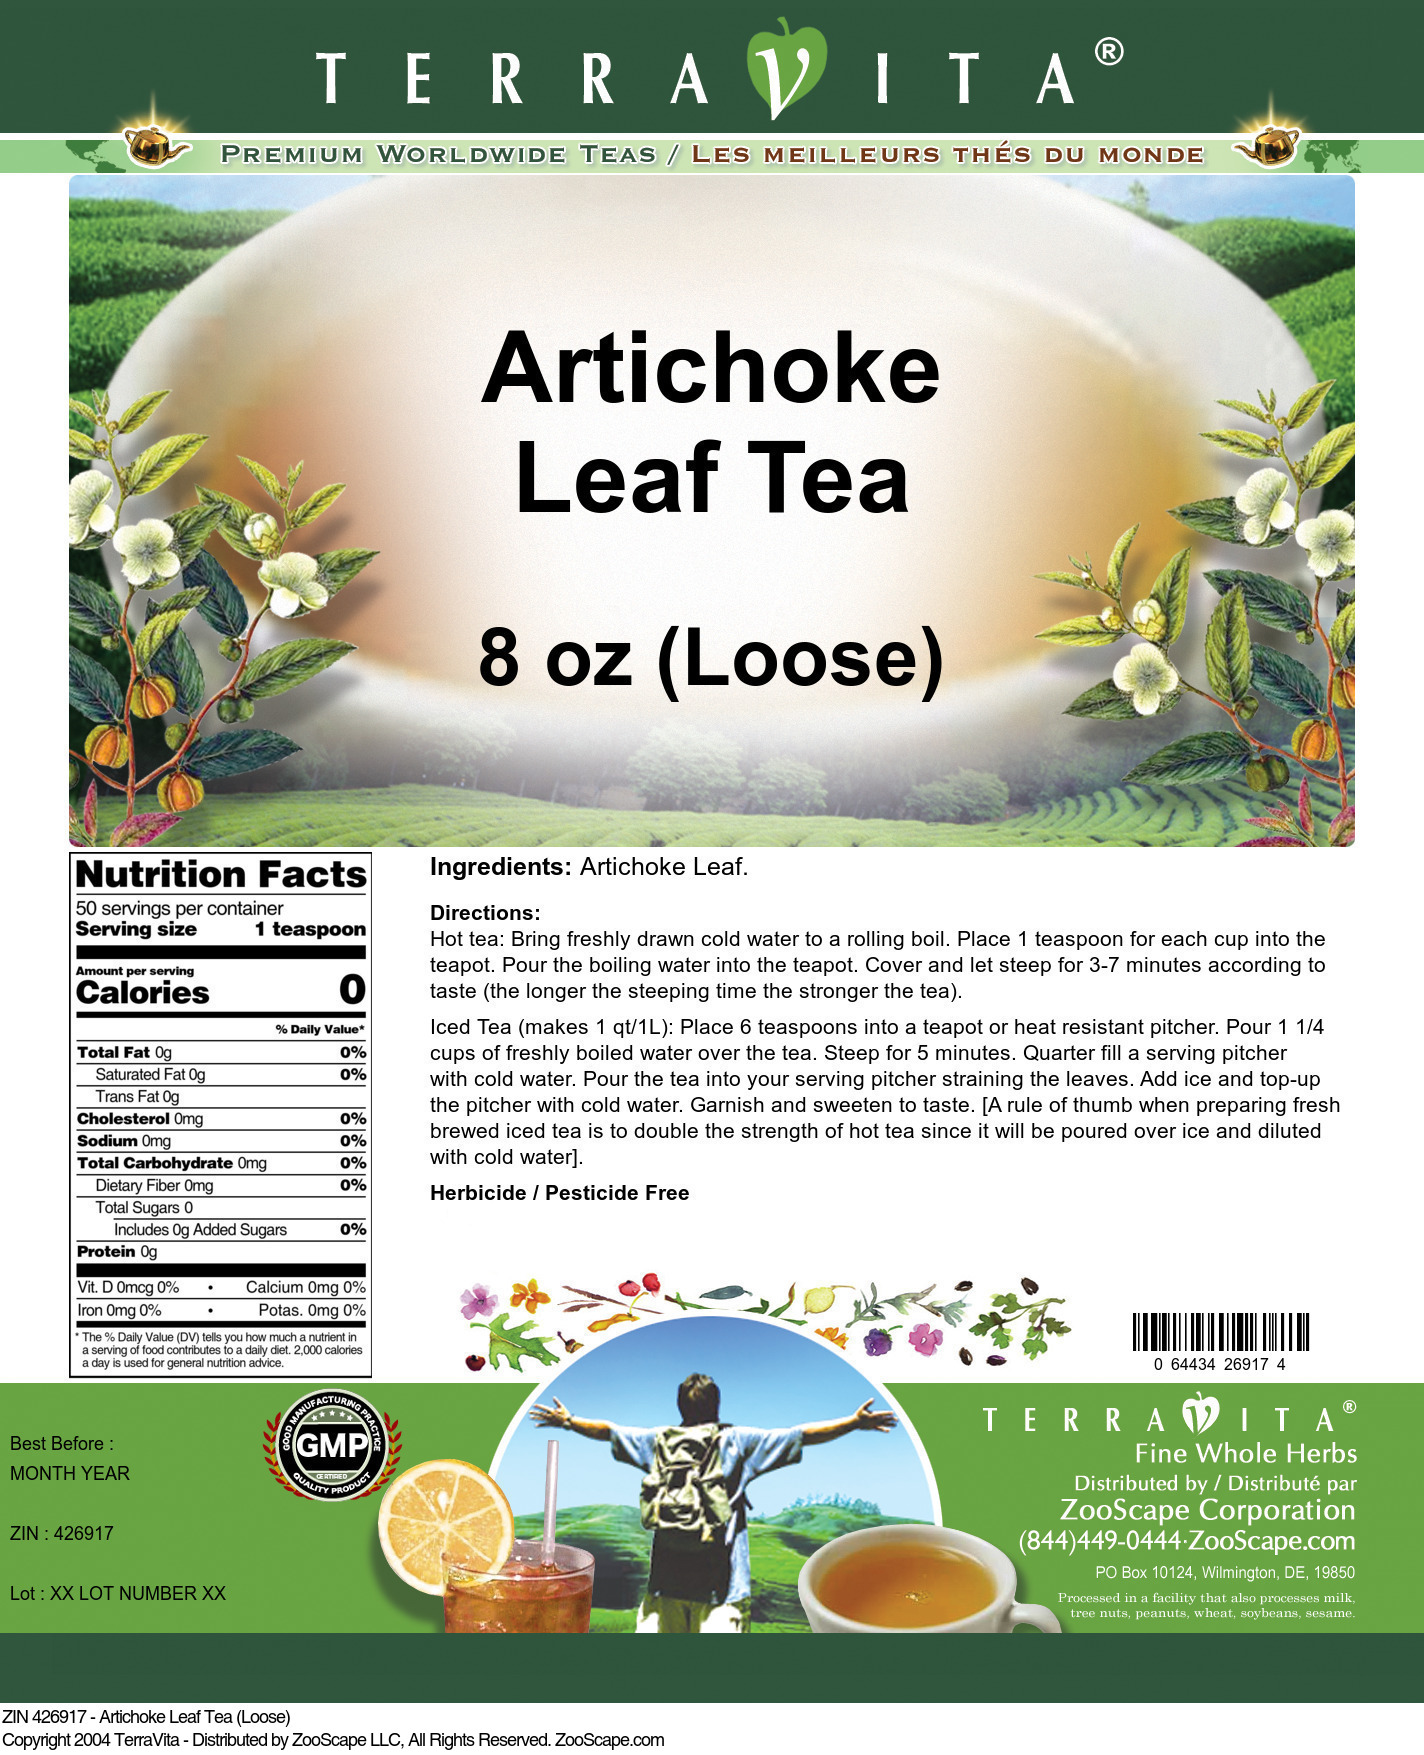 Artichoke Leaf Tea (Loose)